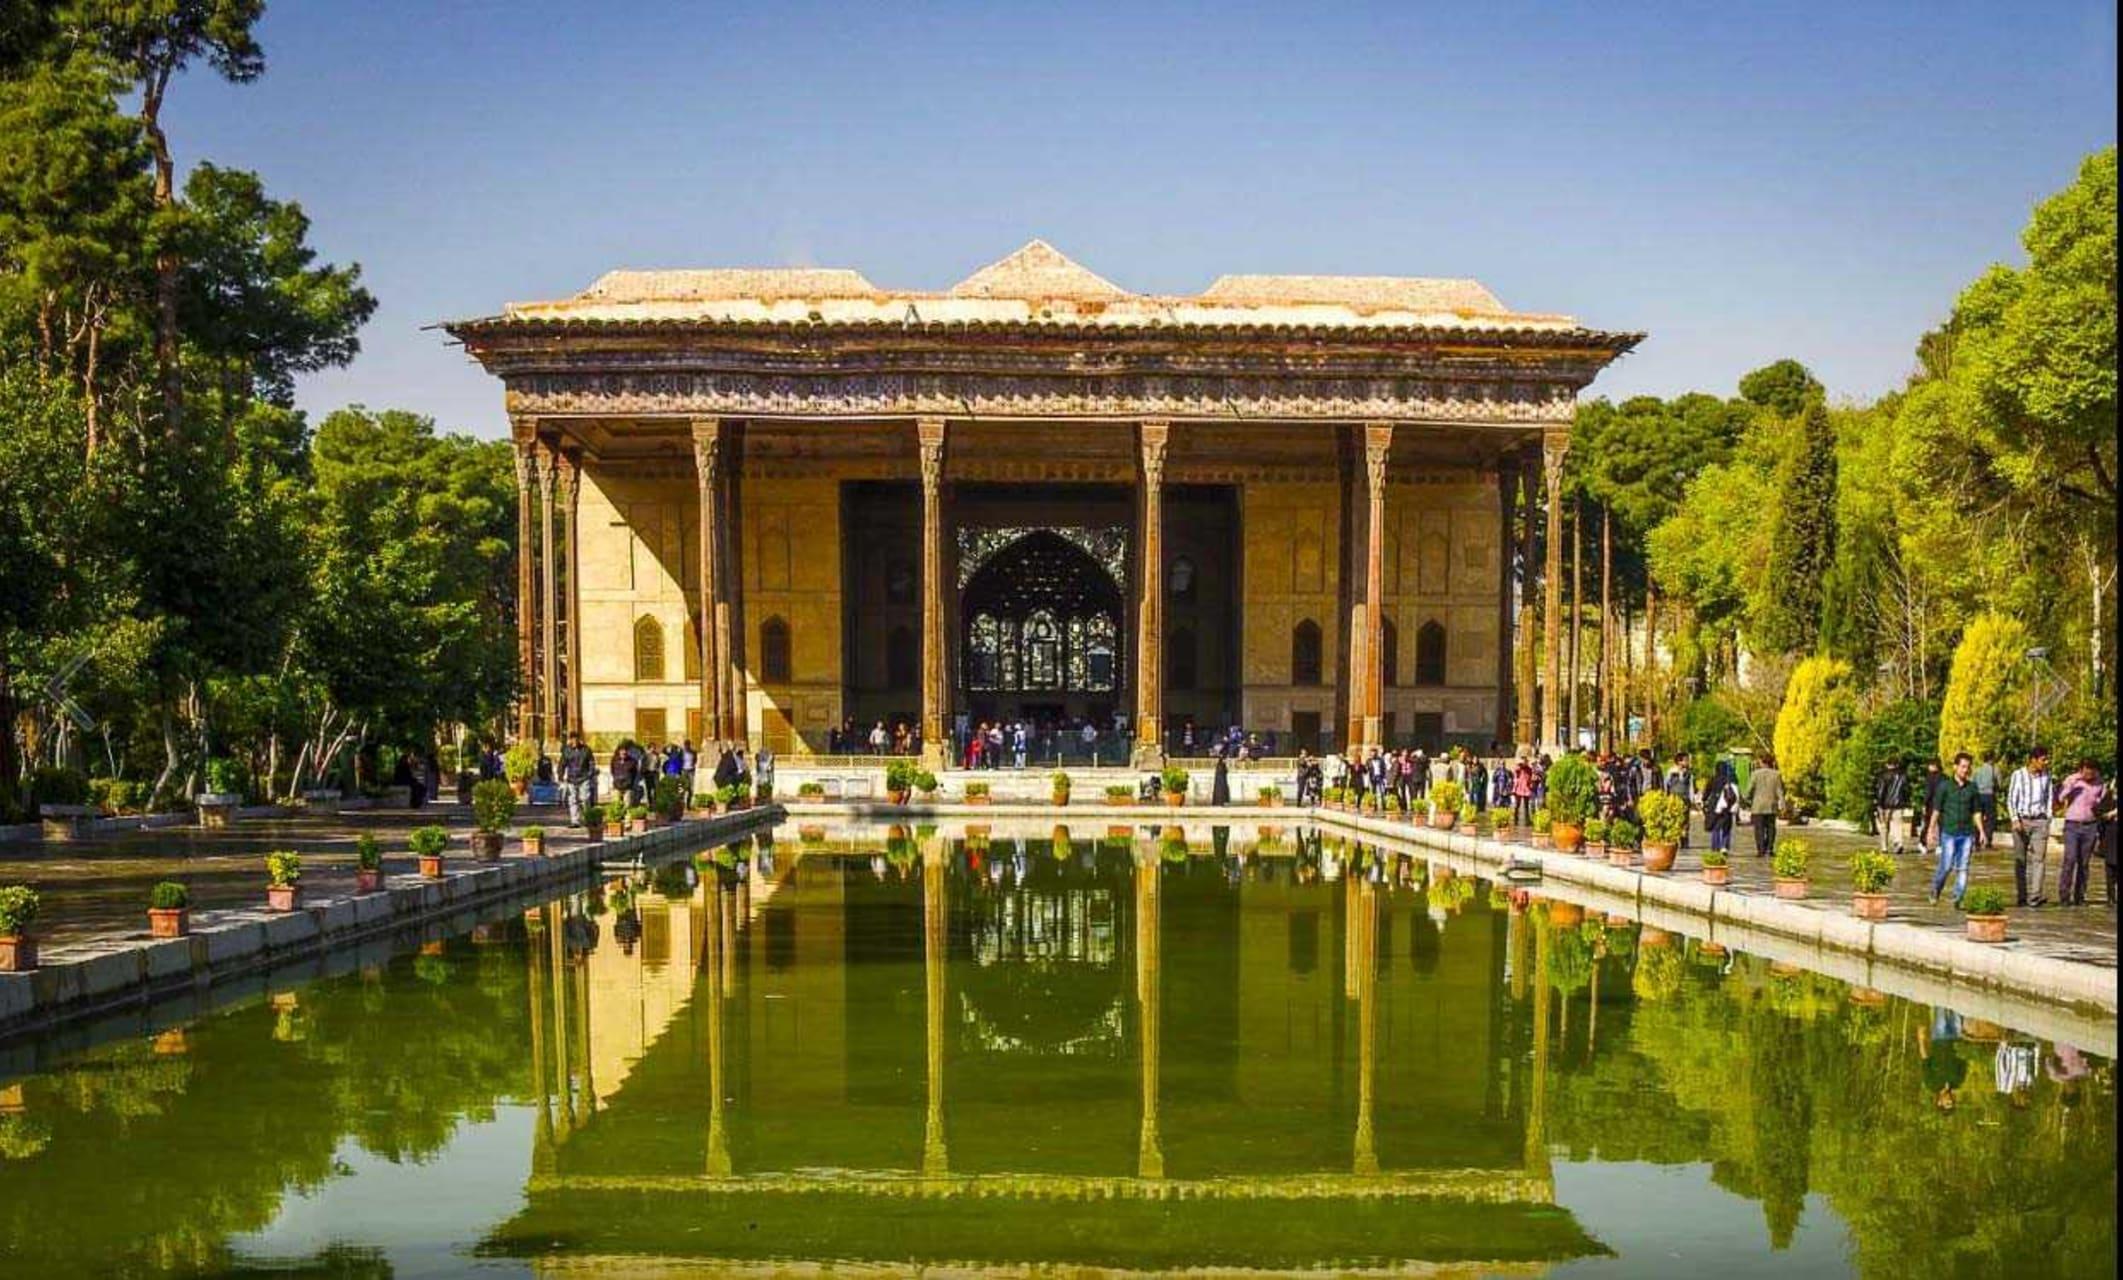 Ispahan - Ispahan: a Nice Royal Garden with a Gorgeous Palace